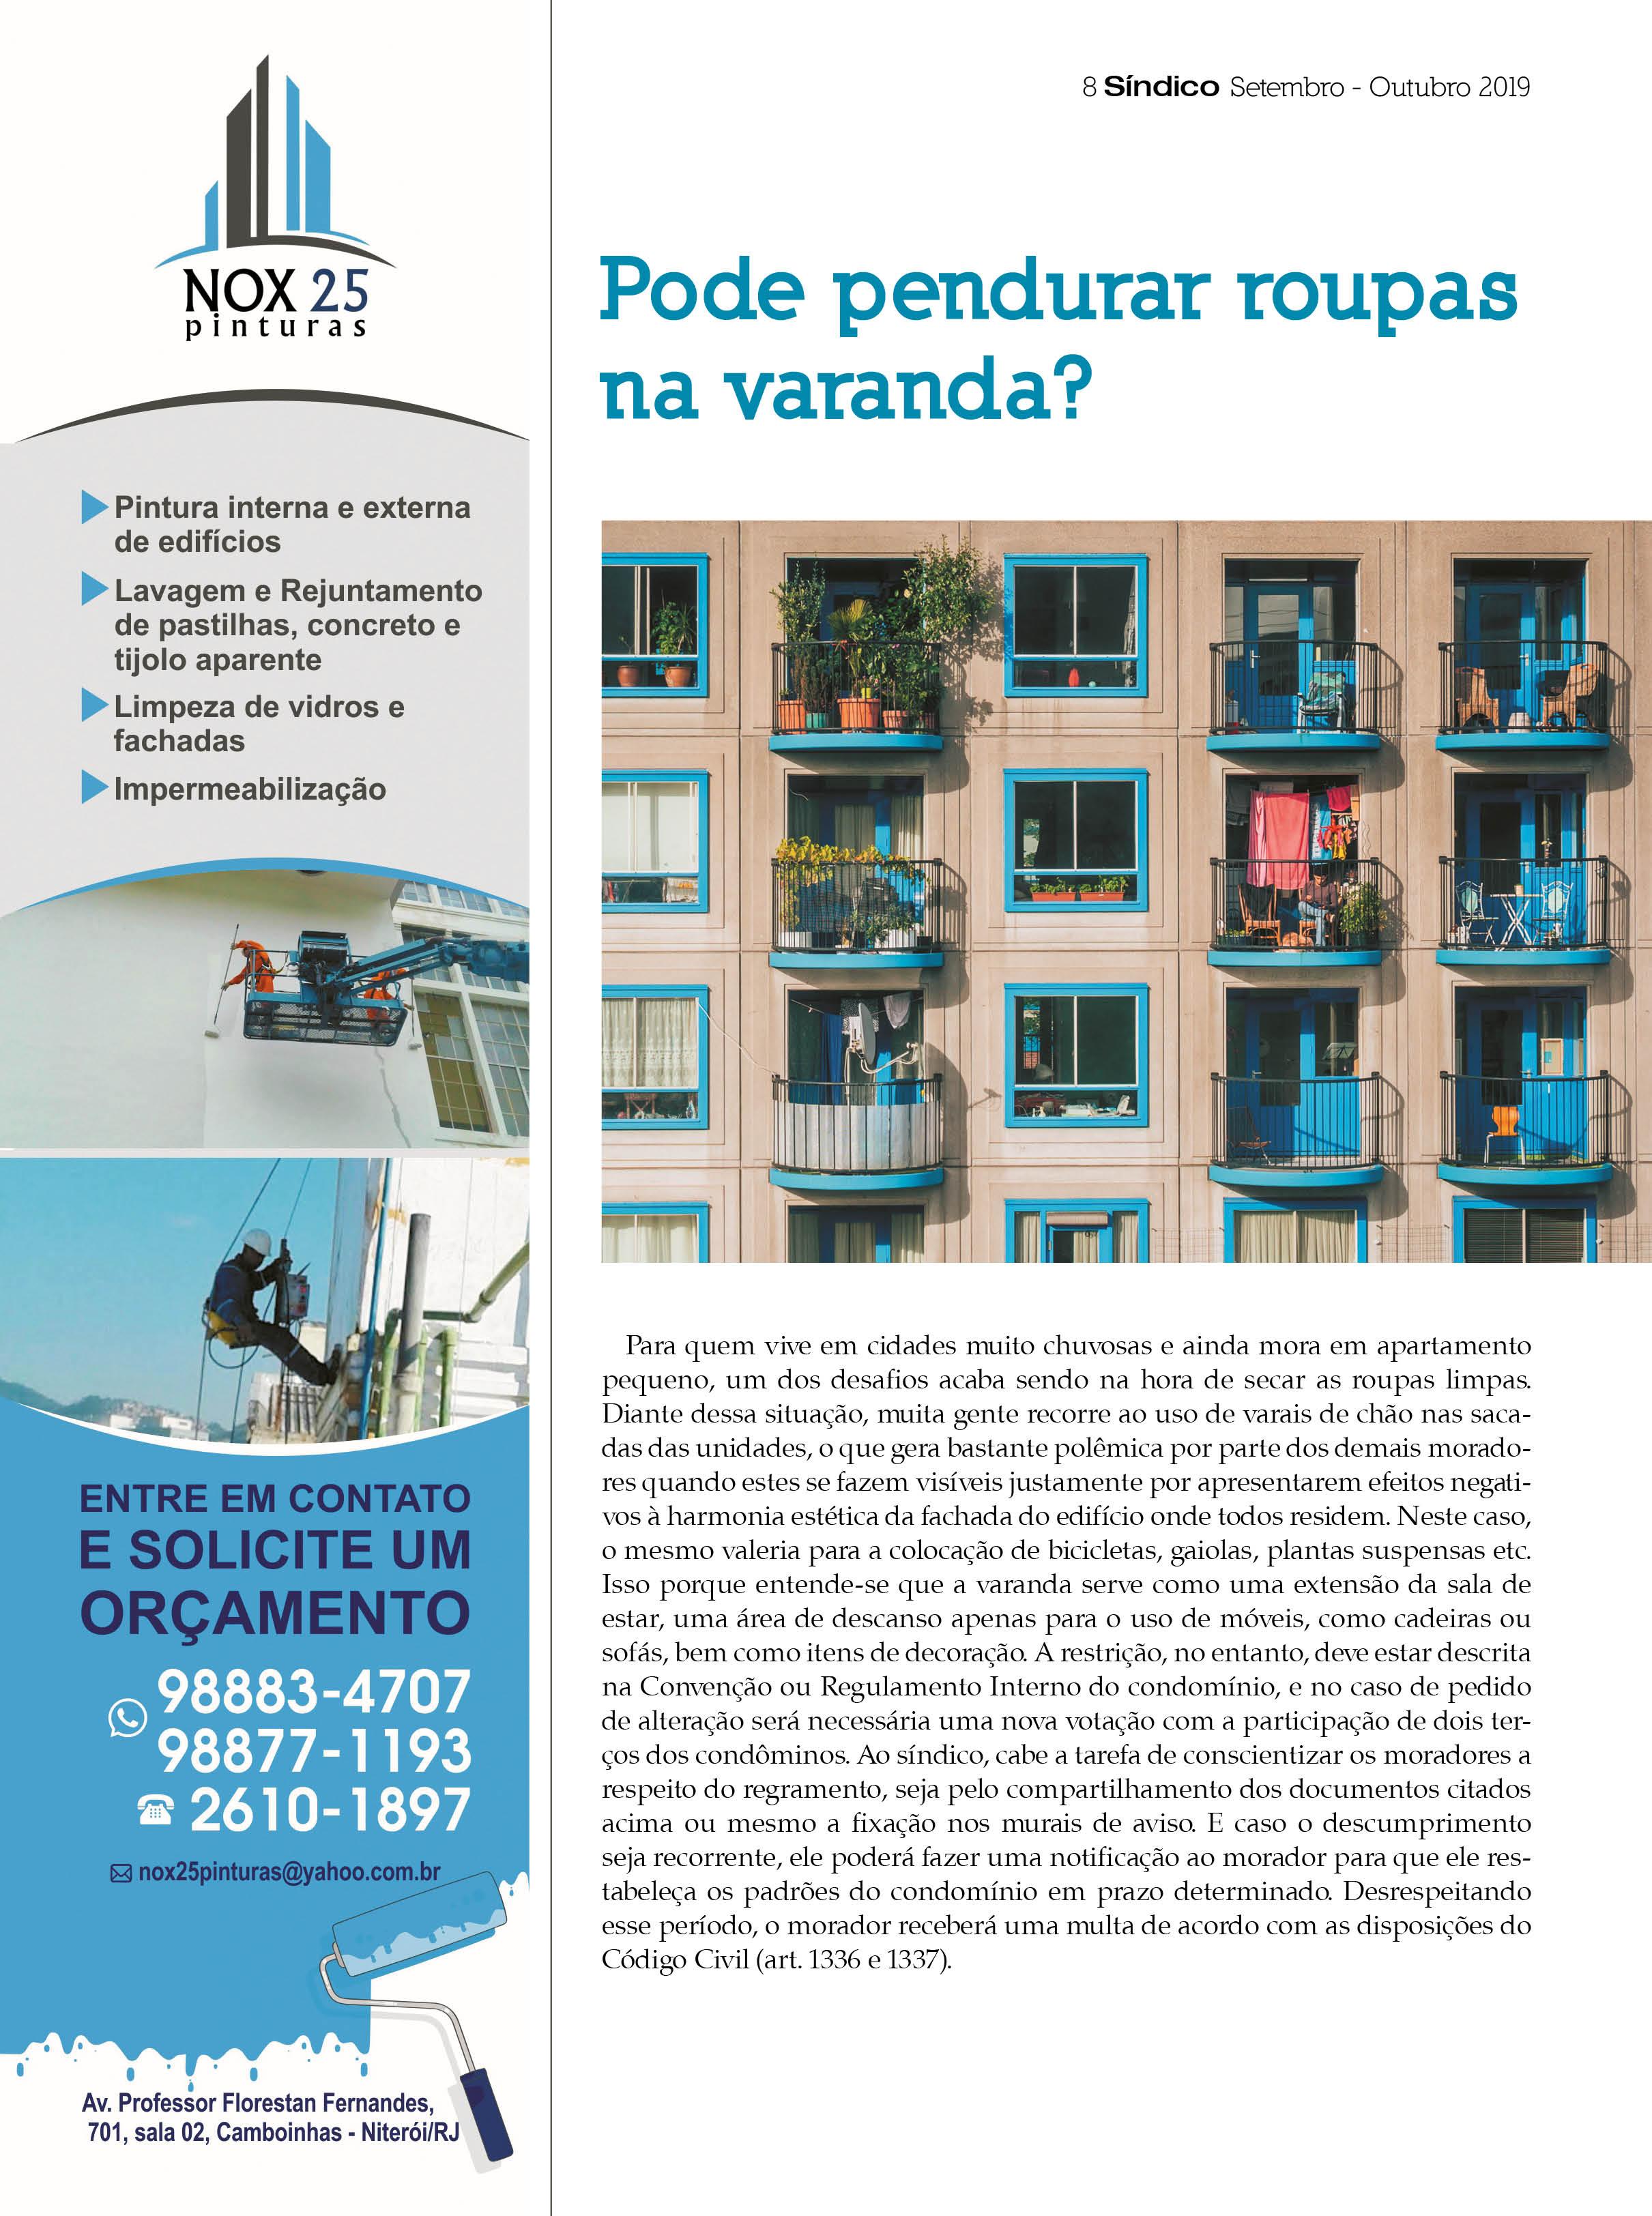 Revista Síndico_ed 246_6